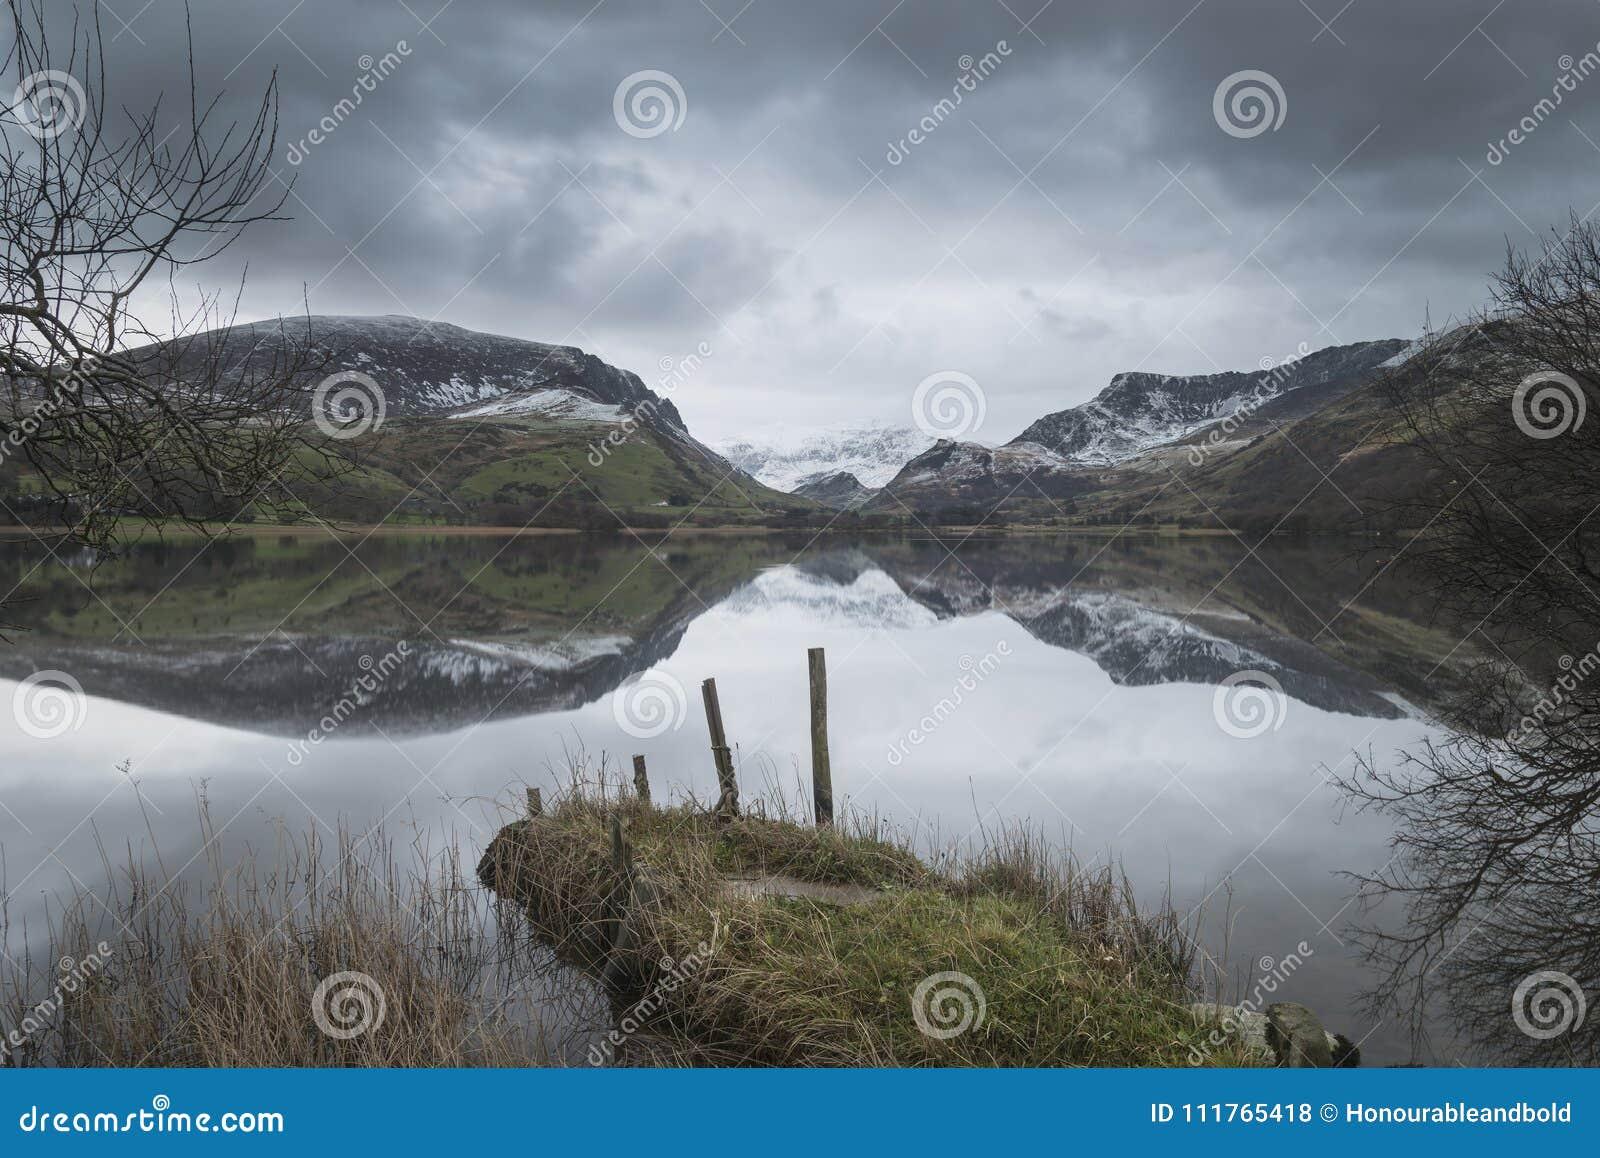 Beautiful Winter landscape image of Llyn Nantlle in Snowdonia Na